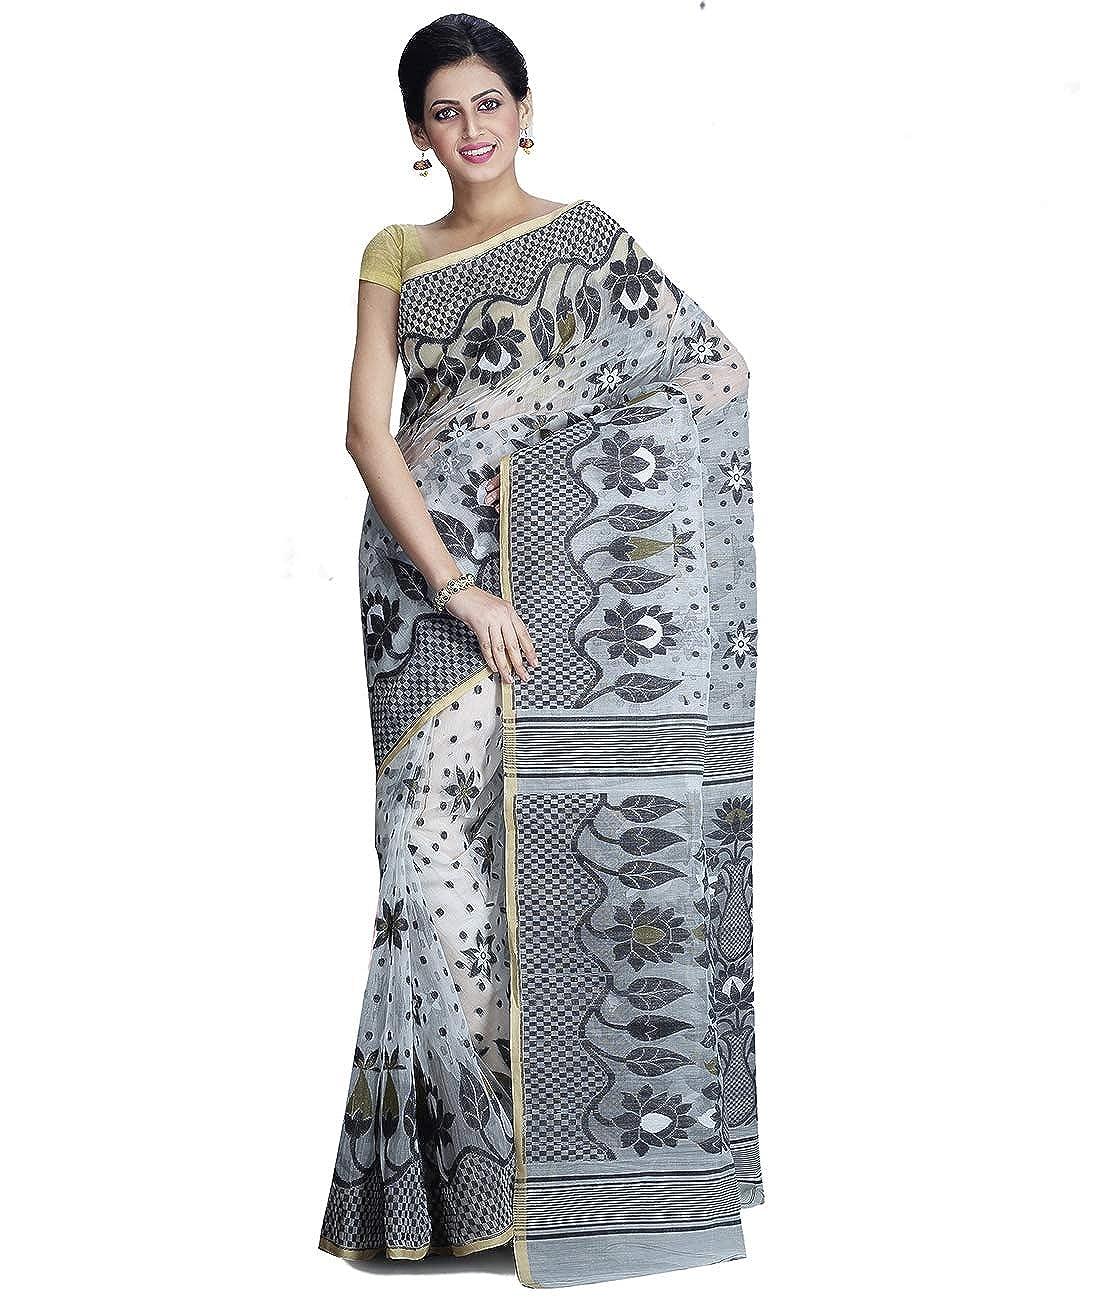 Maahir Garments Exclusive Dhakai Jamdani Grey and OffWhite Colour Handloom Saree